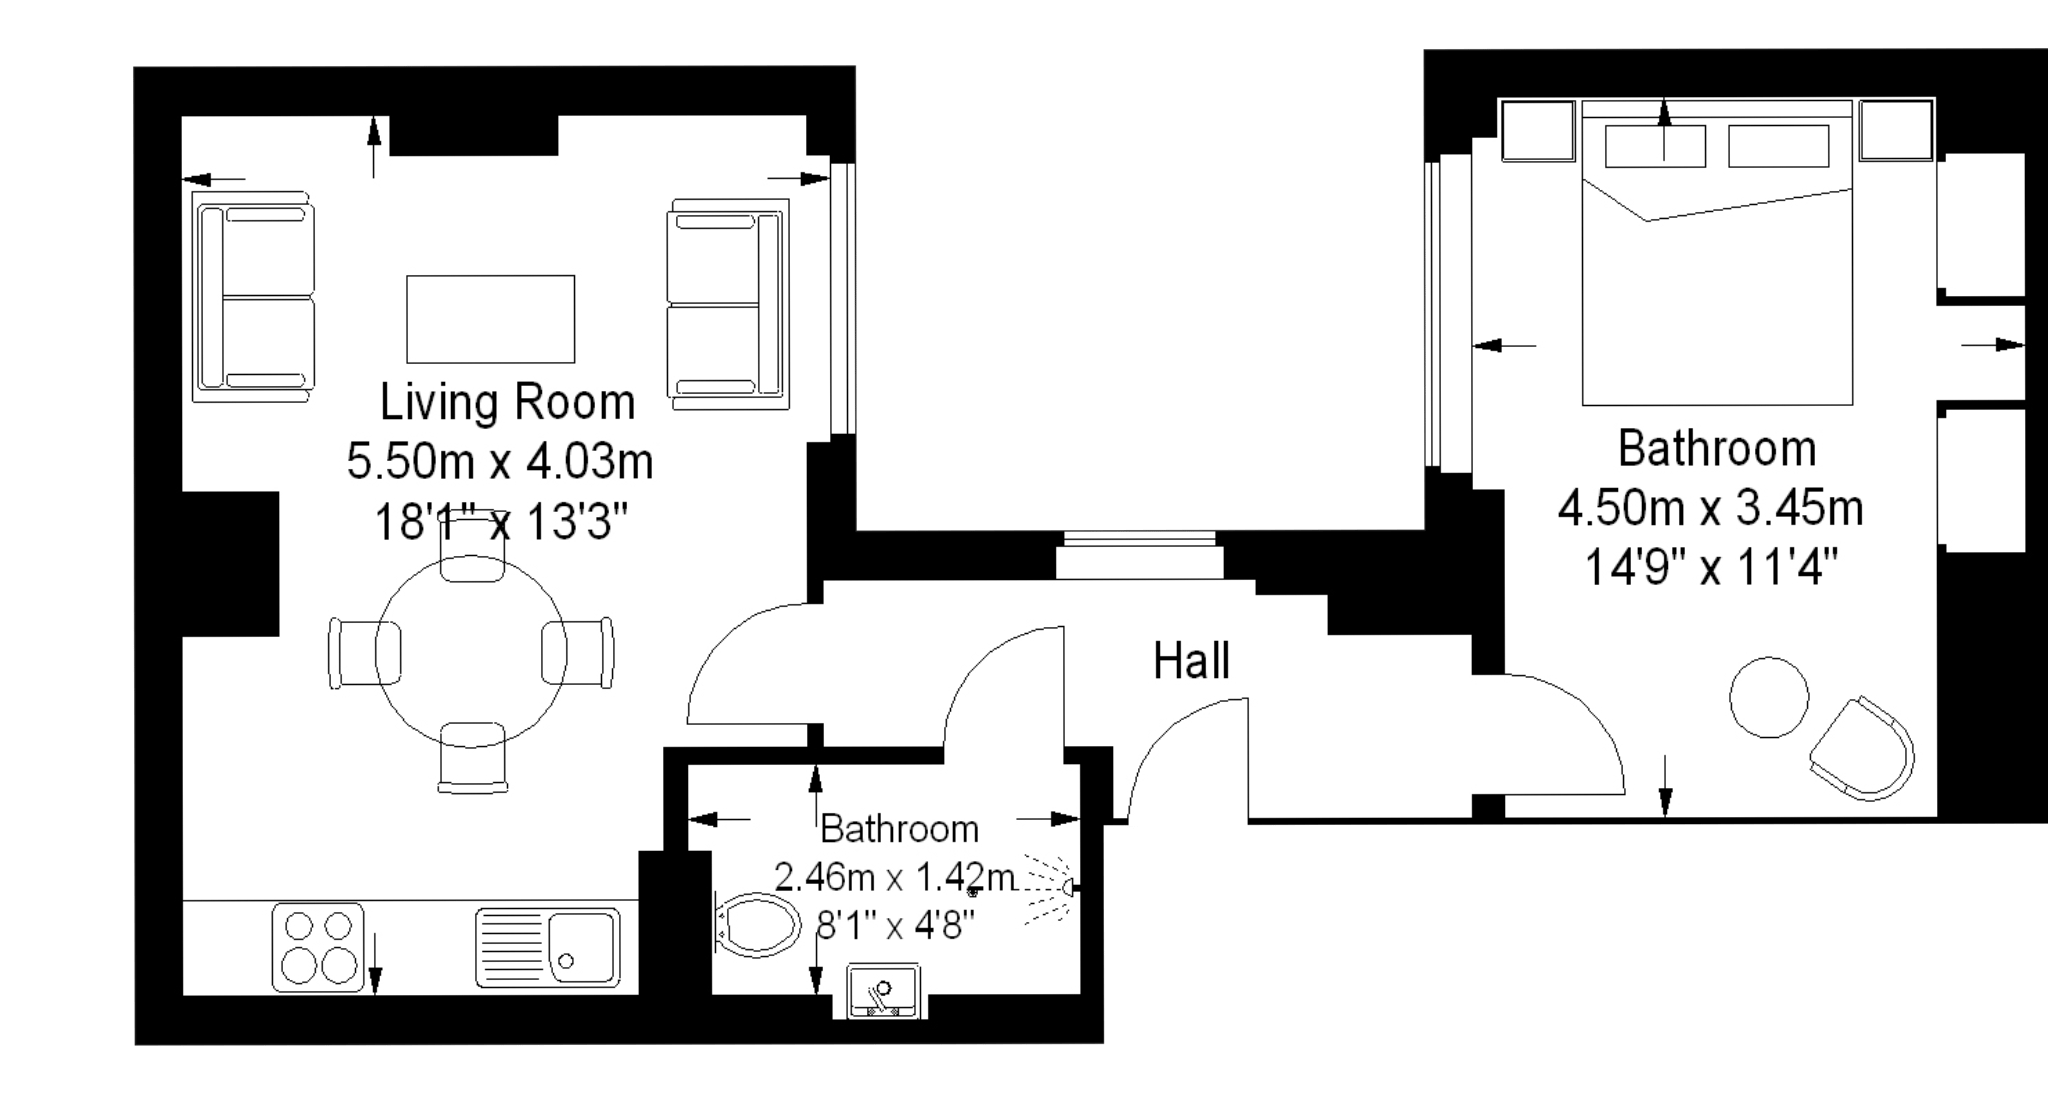 Marylebone Serviced Apartments floorplan two bedroom